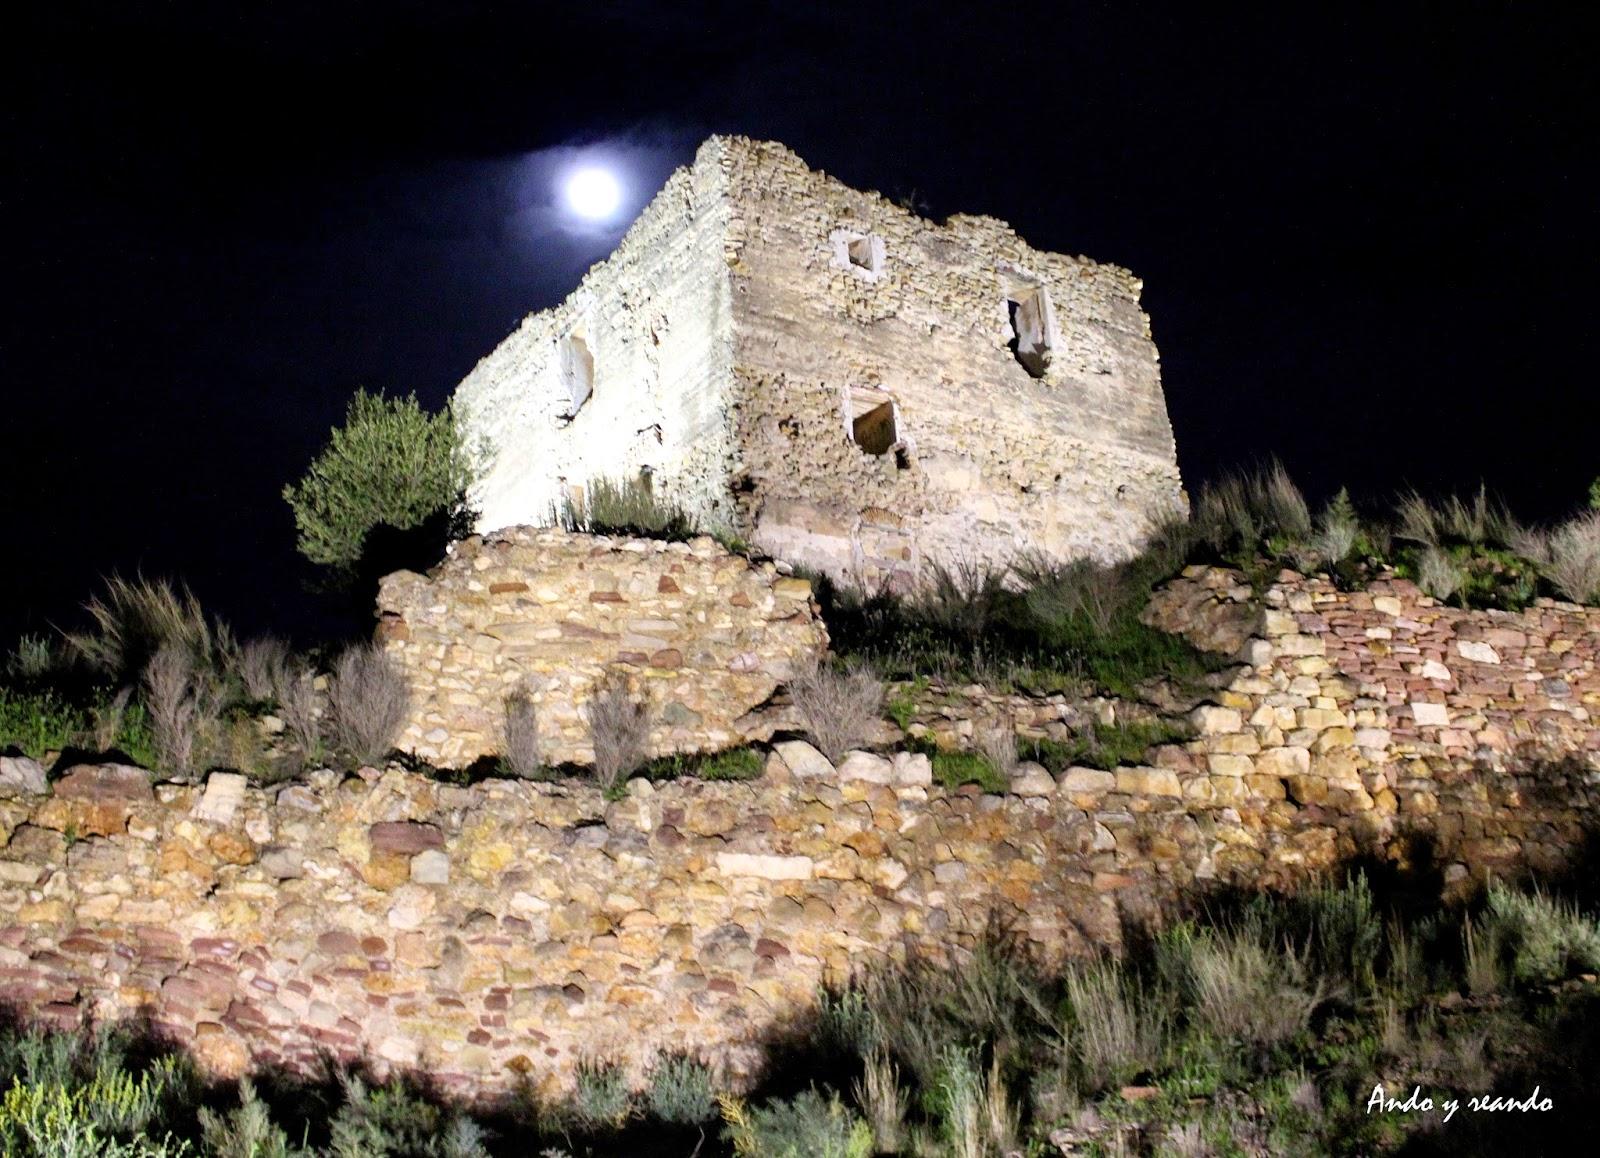 Luna llena en el Castilllo de Torres Torres